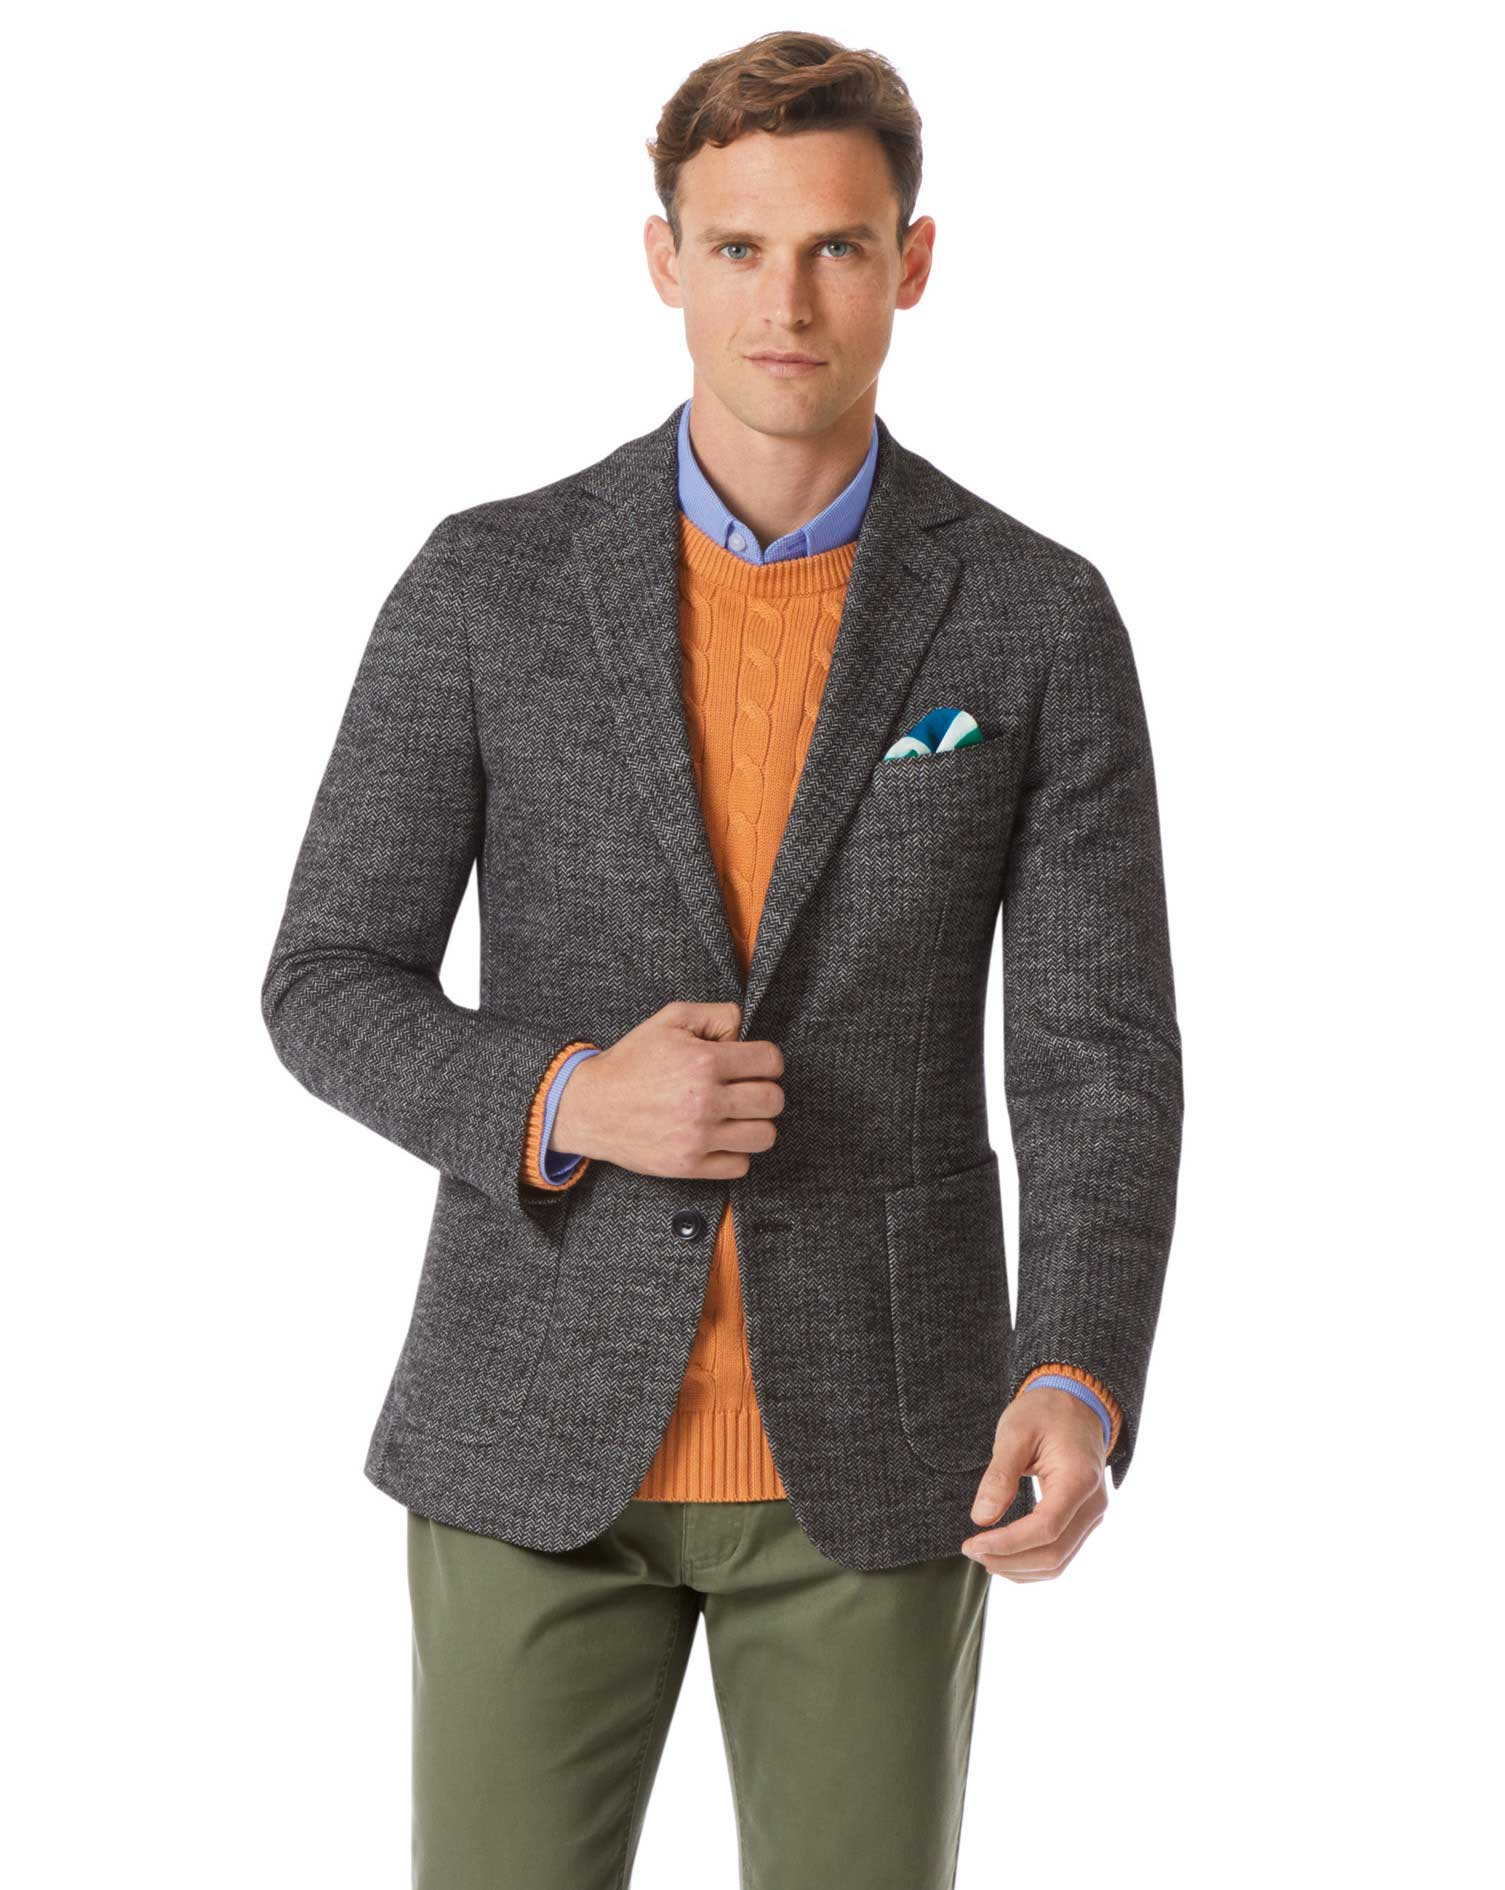 Slim Fit Black and White Stretch Wool Jacket Size 36 Regular by Charles Tyrwhitt